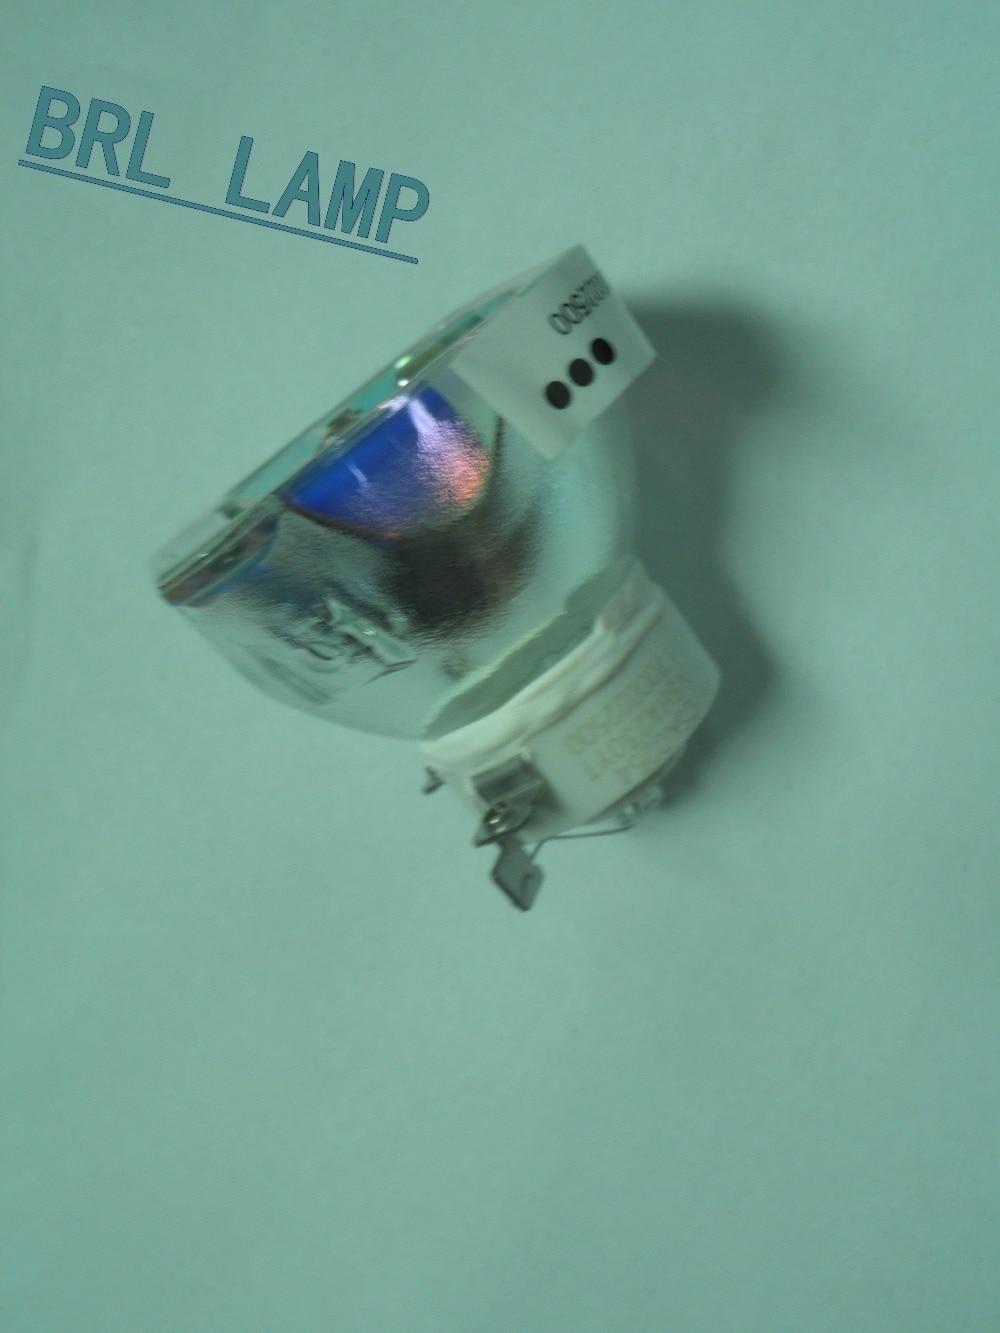 Original& New NSHA230W Projector lamp ET-LAV300 For PT-VW340Z/PT-VW345NZ/PT-VW350/PT-VW355N/PT-VX410Z/PT-VX415NZ/PT-VX420/VX42Z